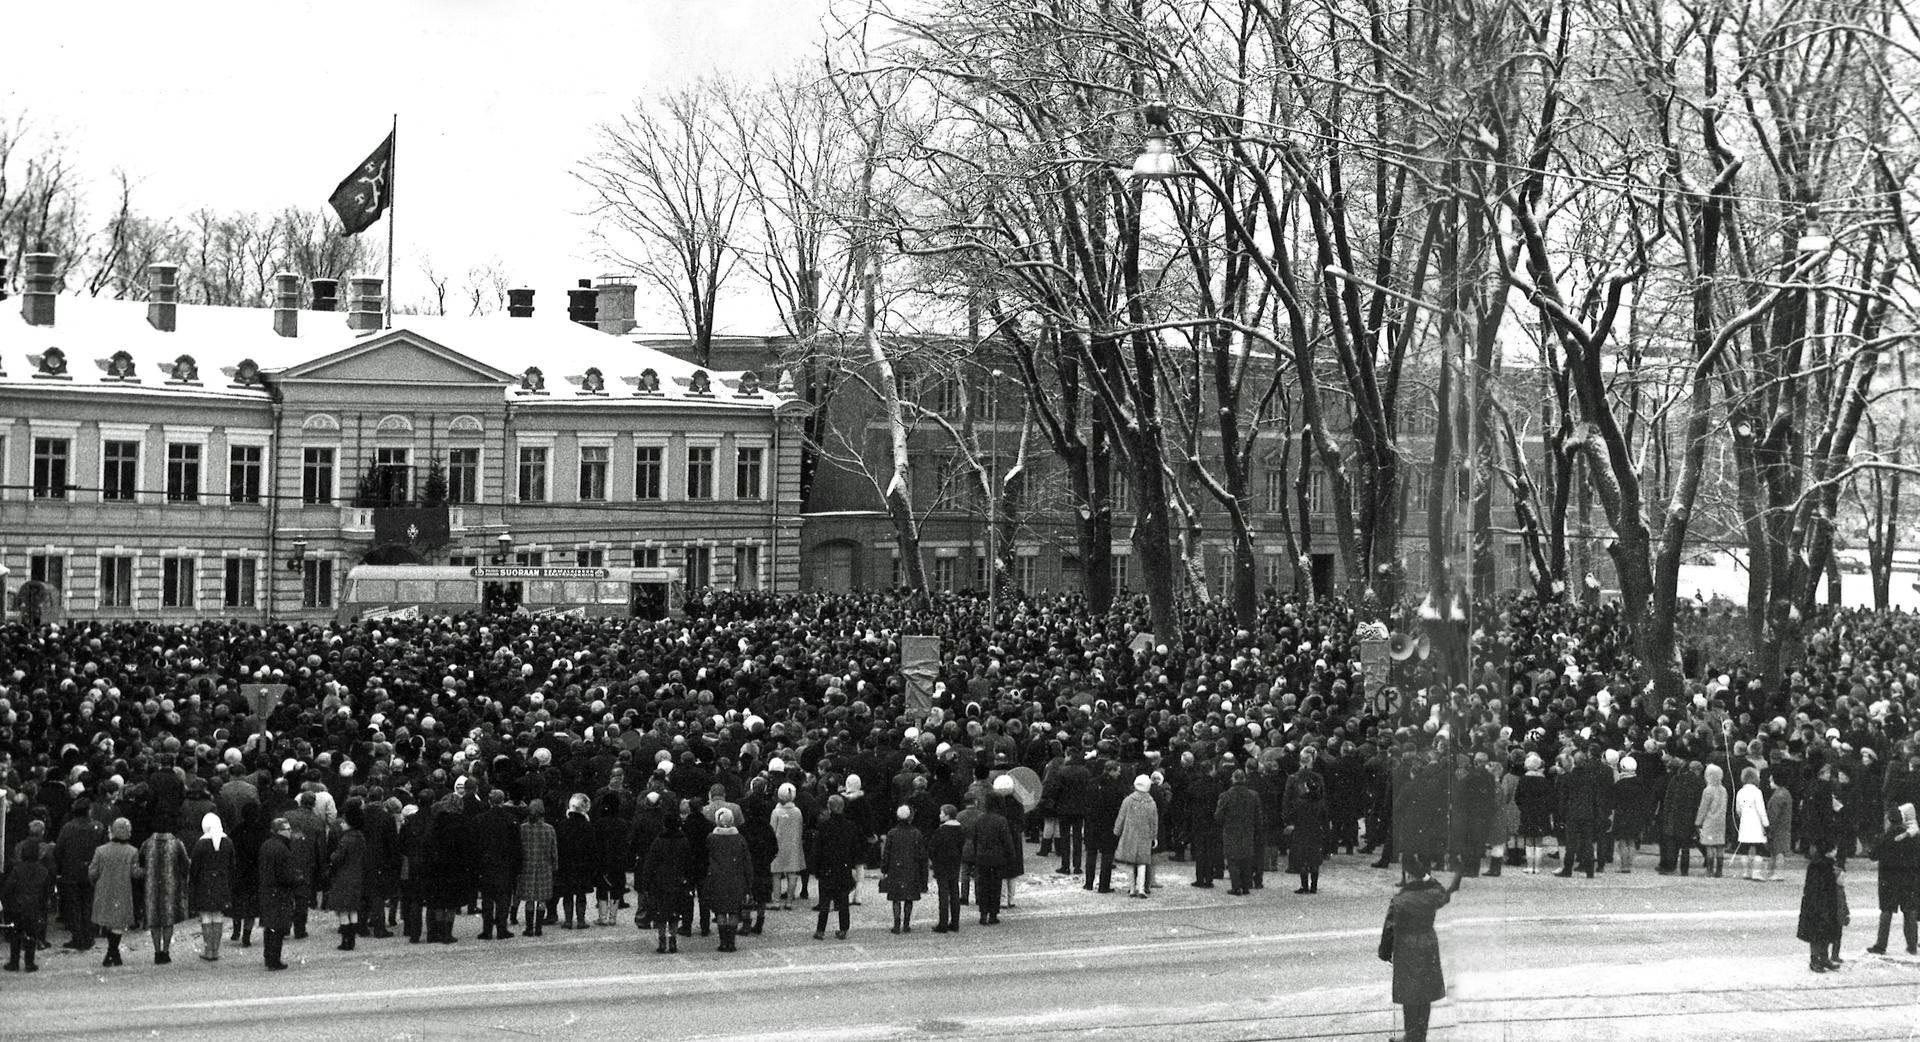 joulurauha 2018 File:Joulurauha Turku 1967.   Wikimedia Commons joulurauha 2018